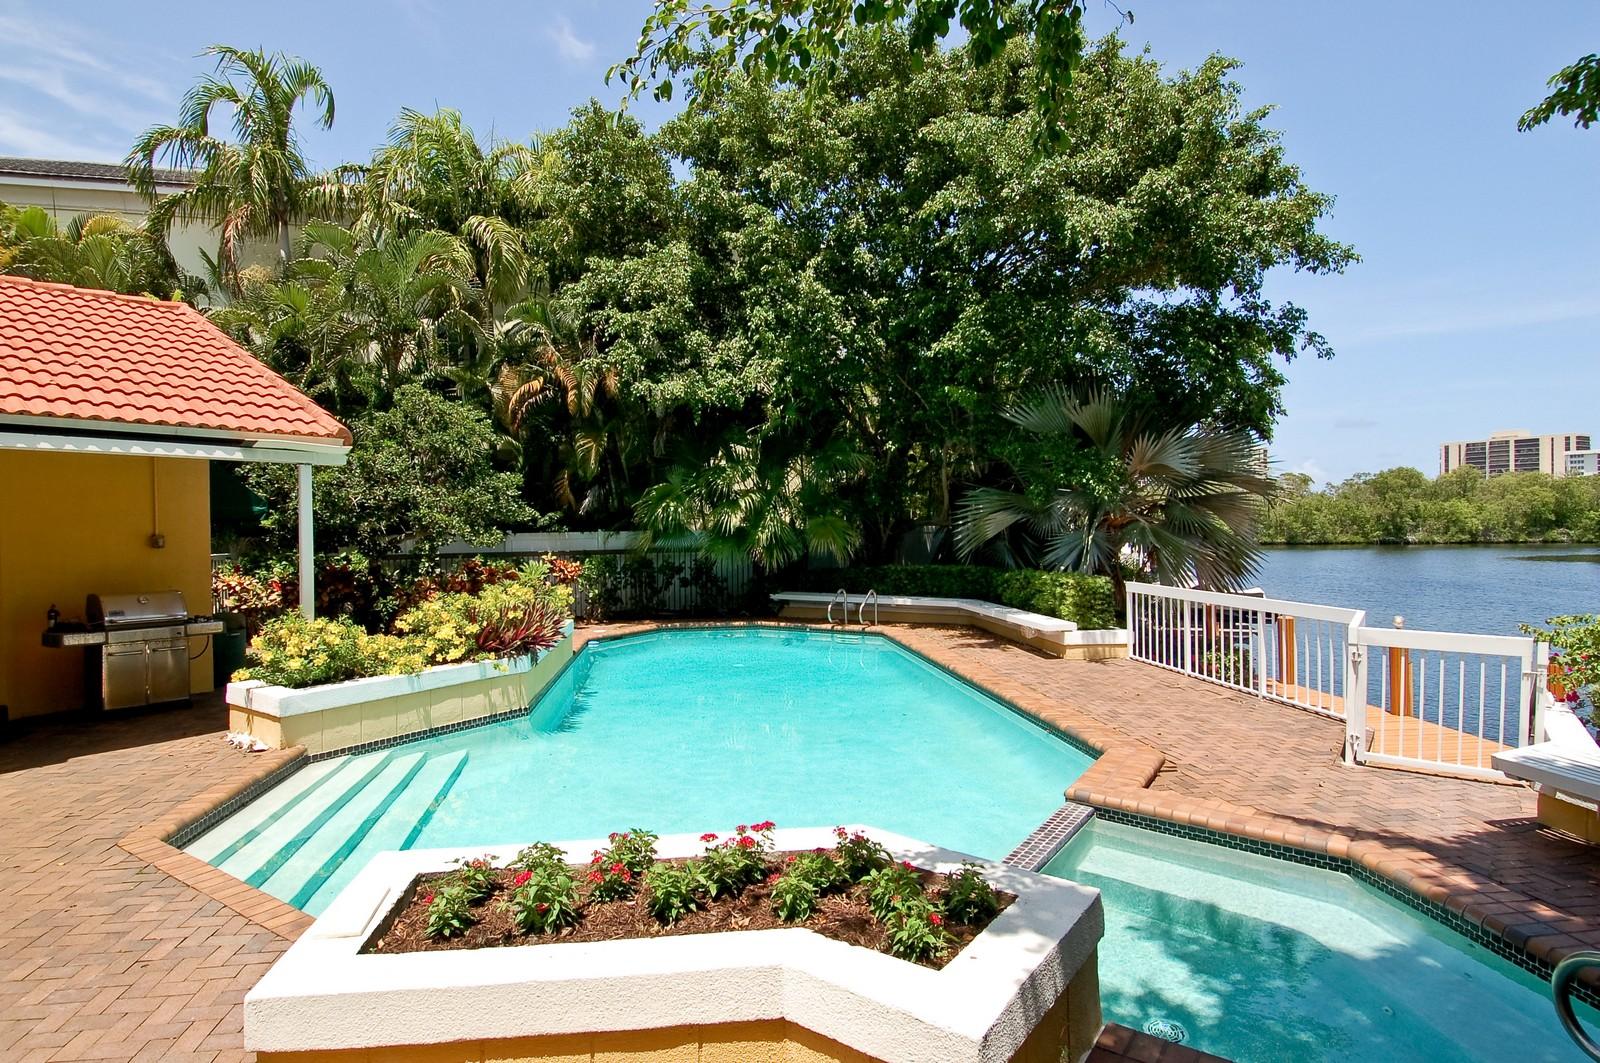 Real Estate Photography - 4798 Sanctuary Ln, Boca Raton, FL, 33431 - Pool